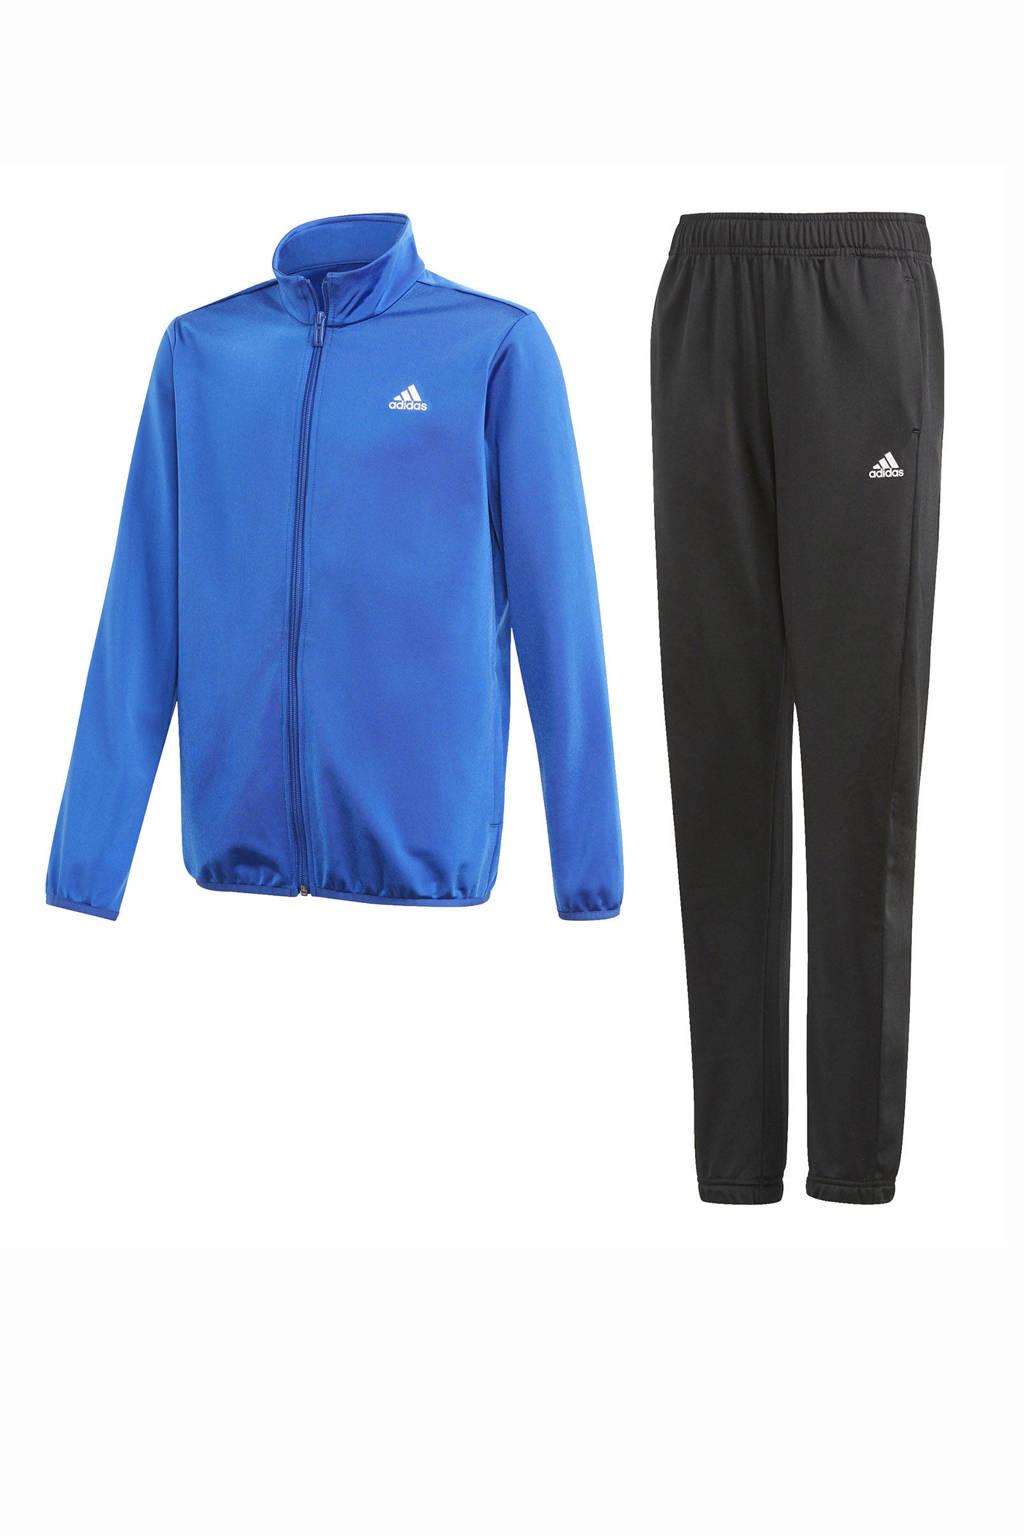 adidas Performance   trainingspak kobaltblauw/zwart, Kobaltblauw/zwart